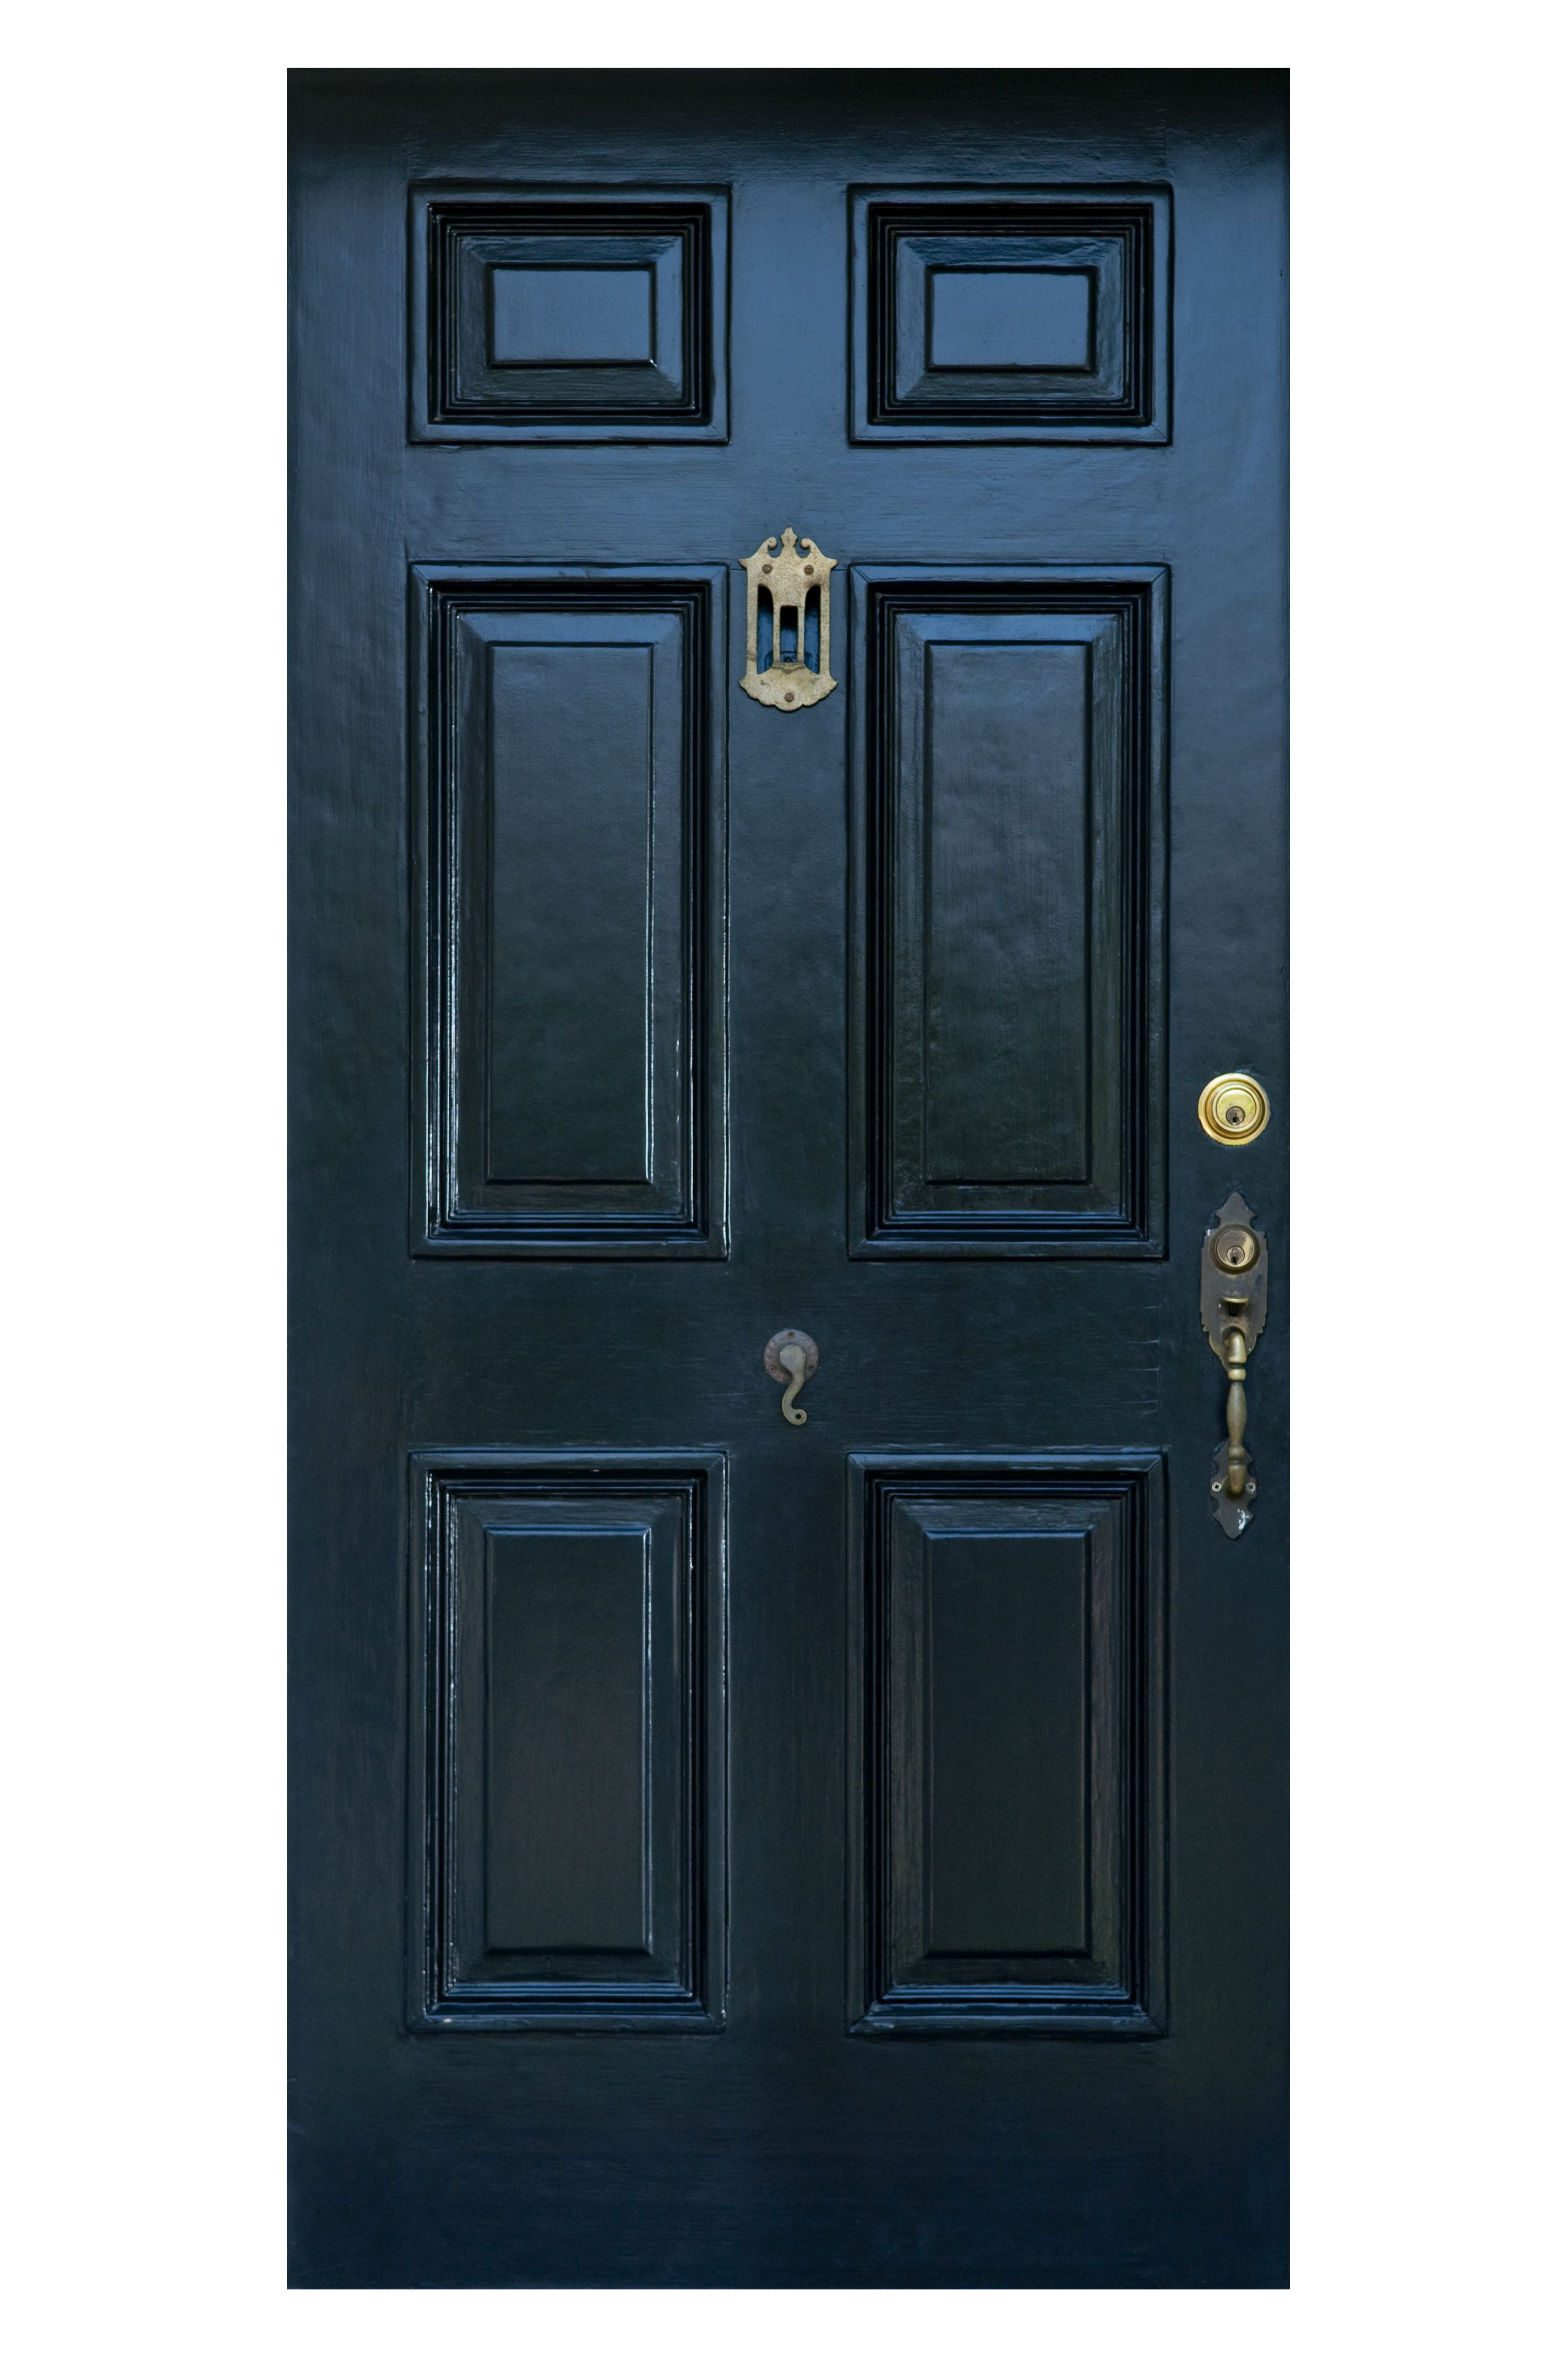 Hollow Core Doors Advantages and Disadvantages